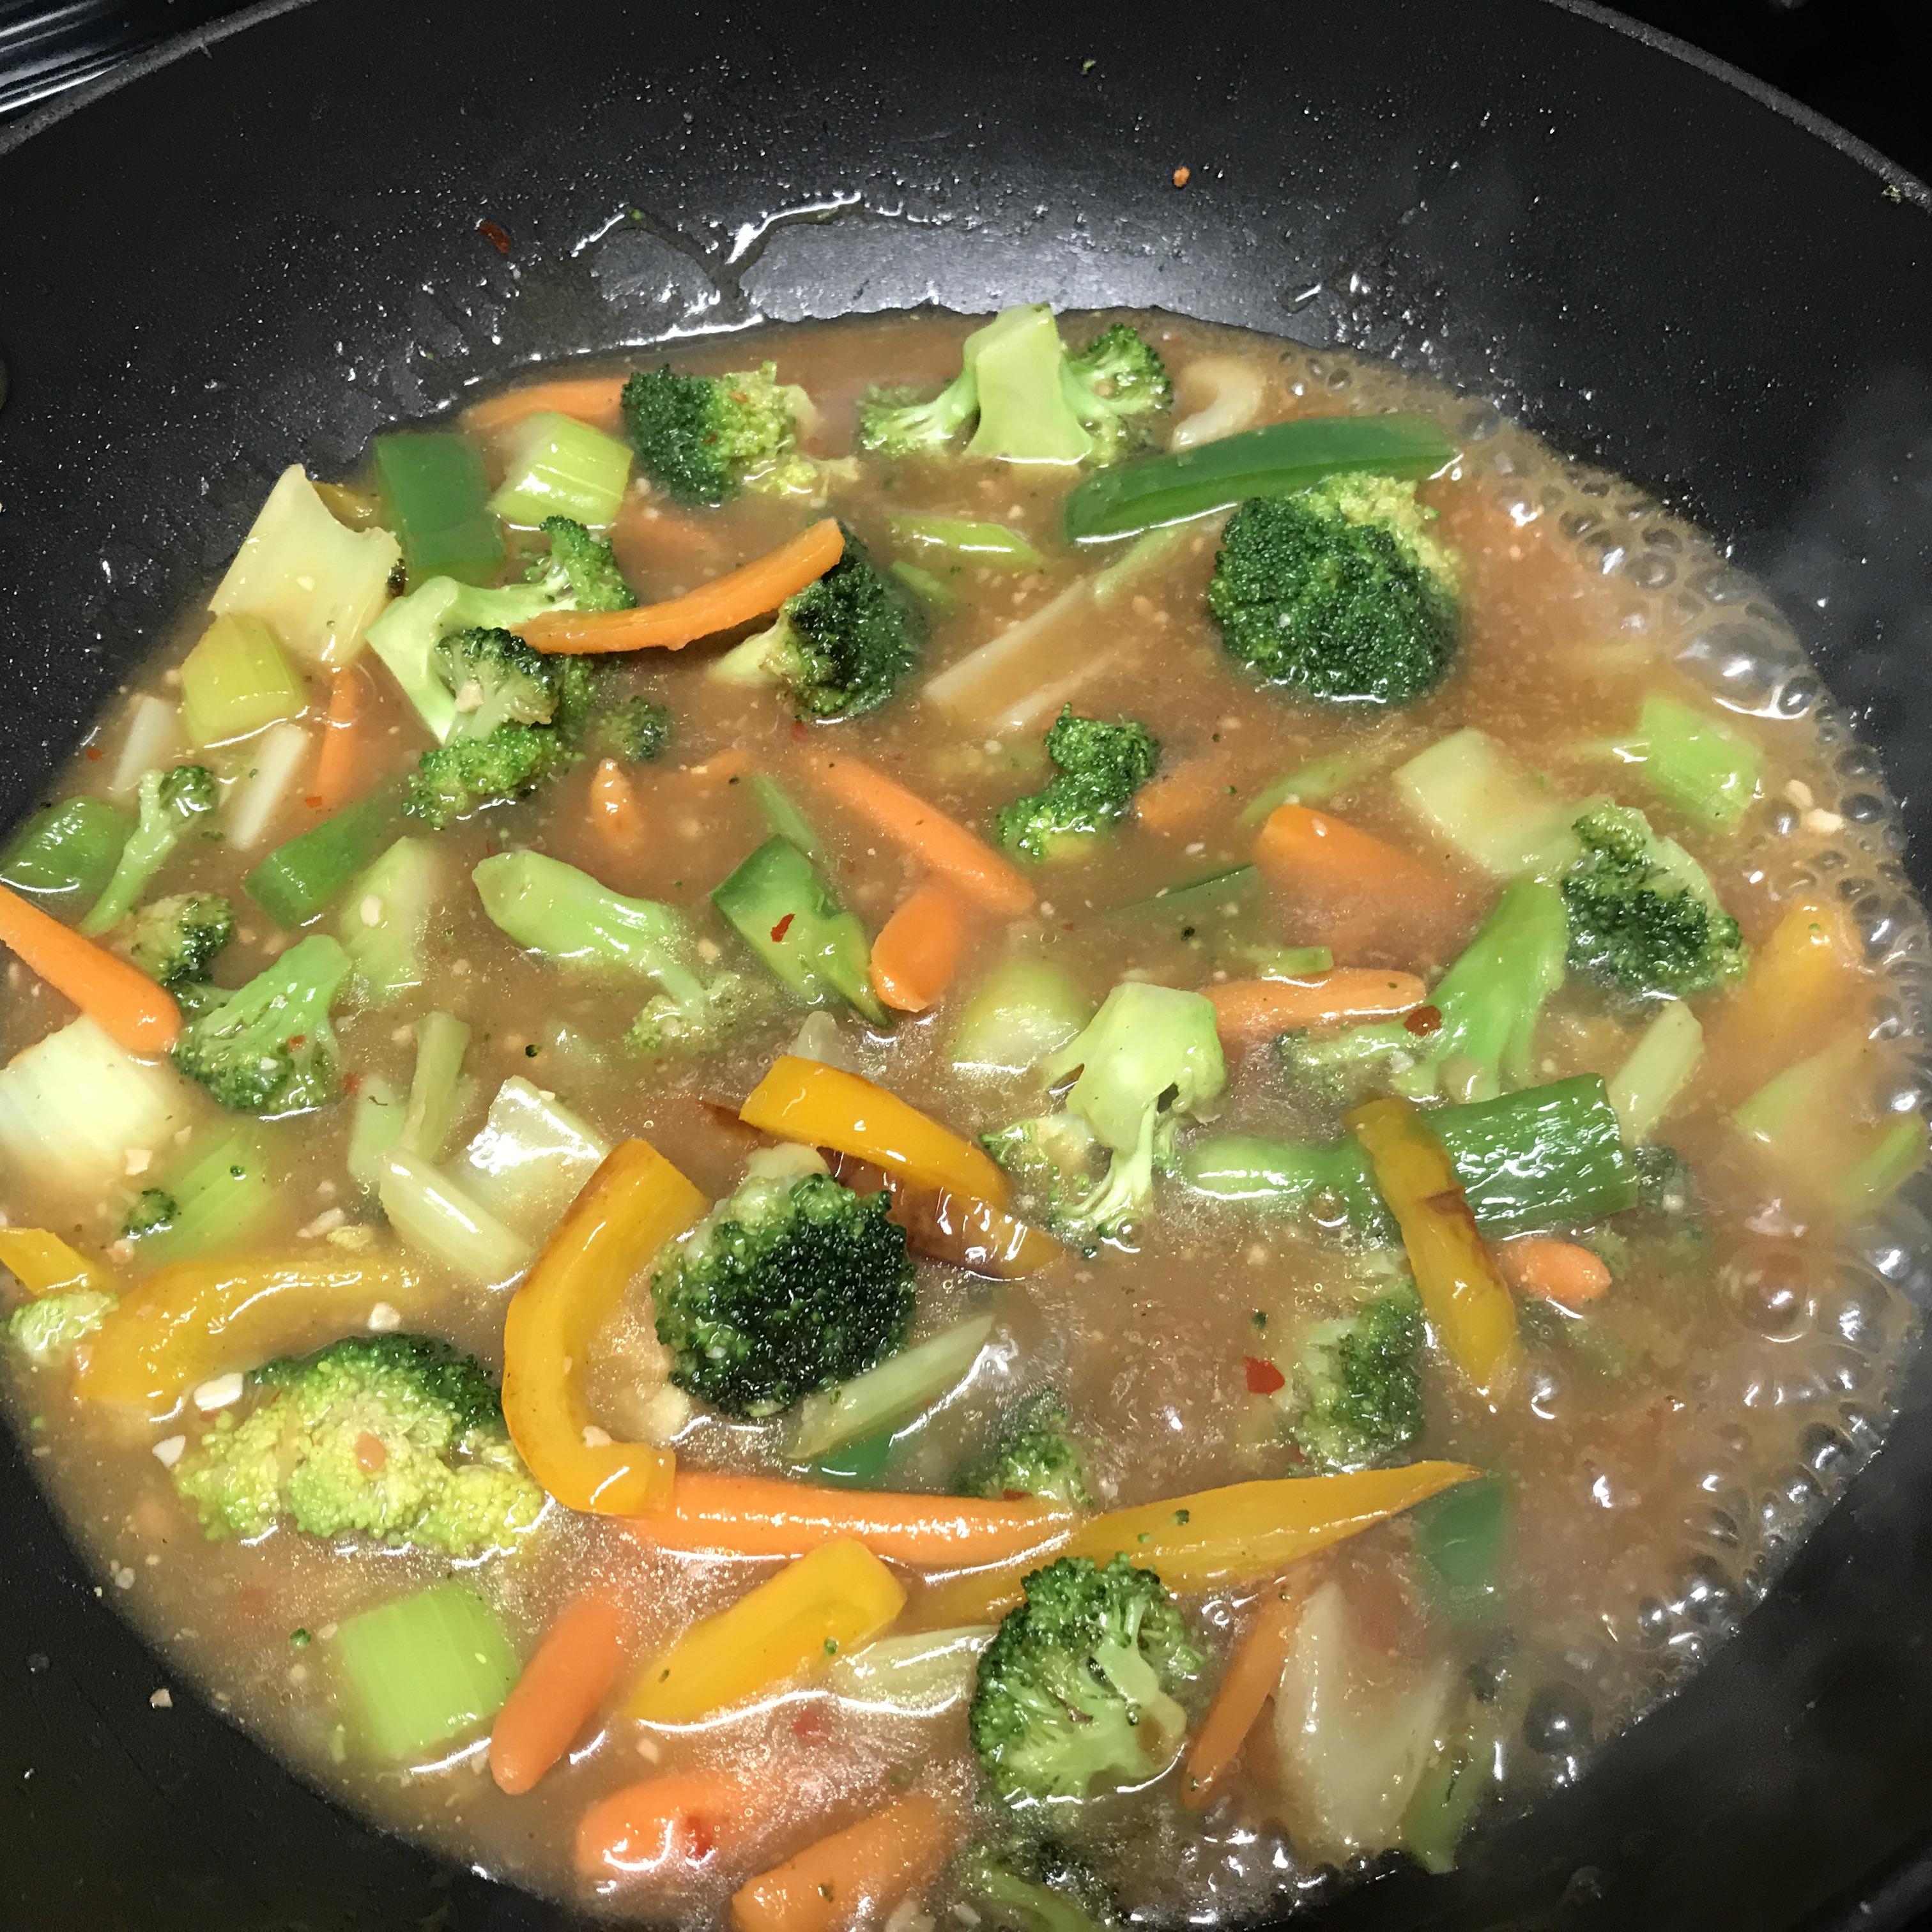 Stir-Fried Vegetables patrice